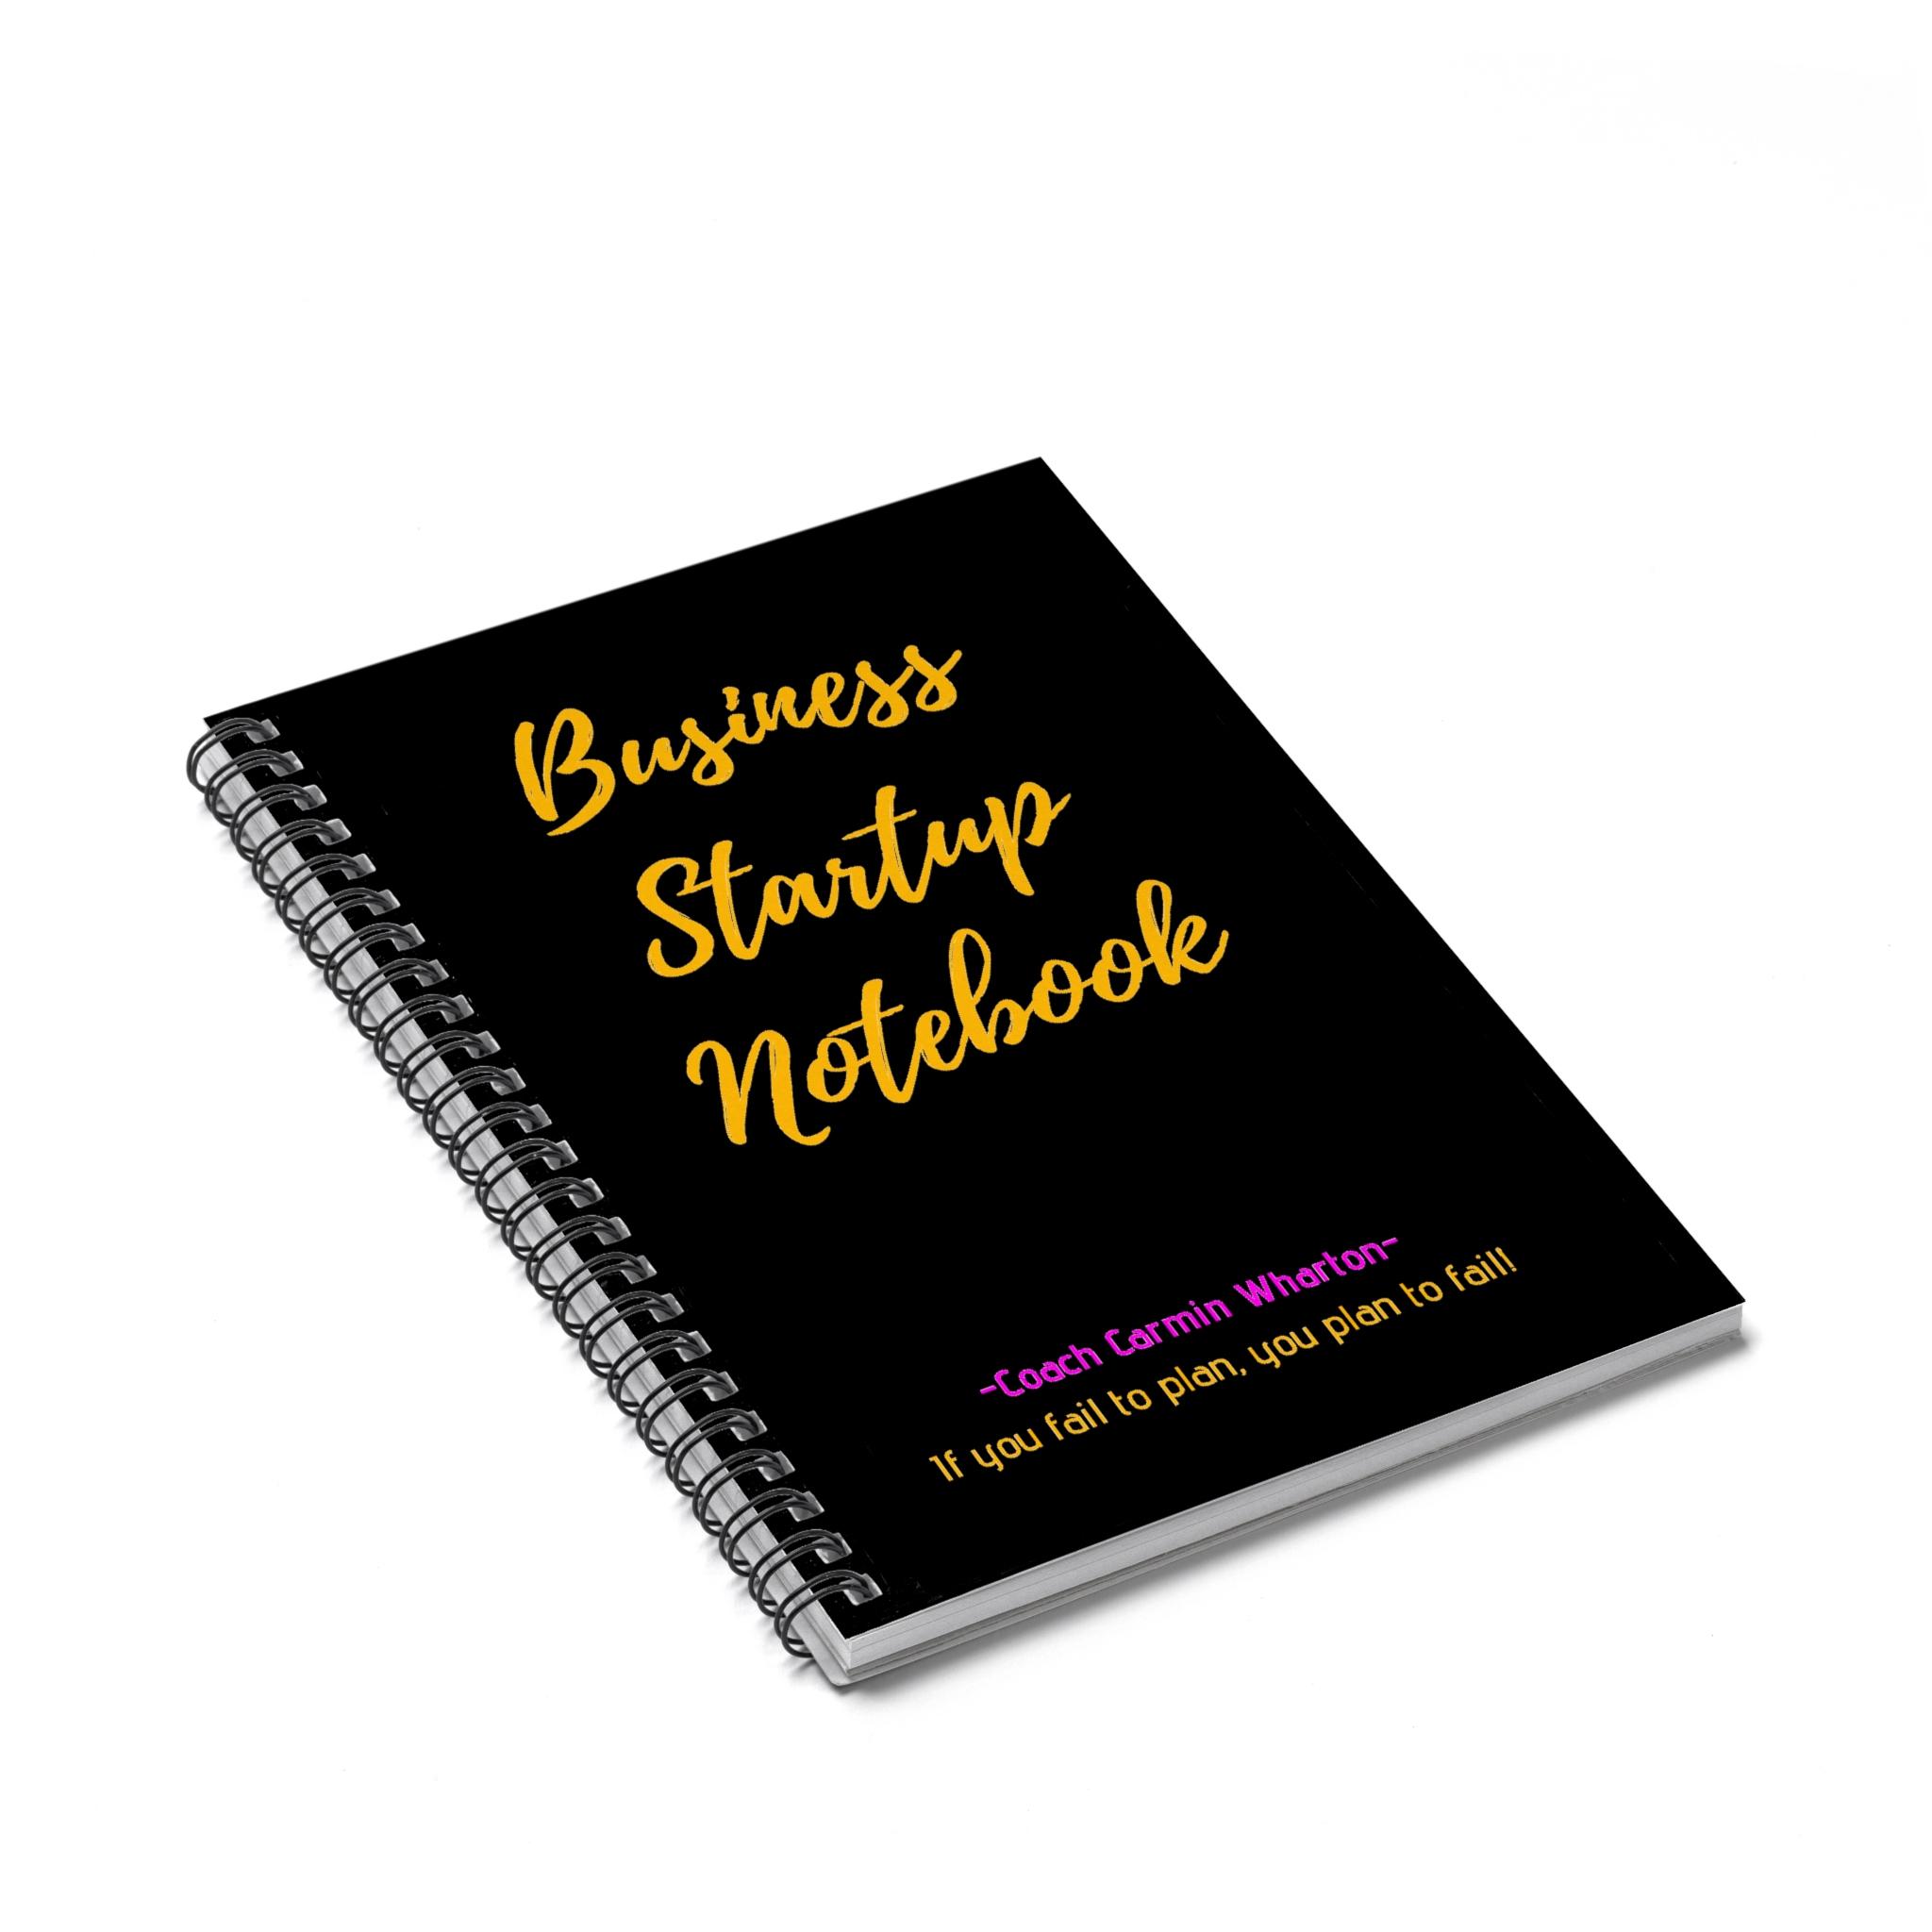 Business Startup Notebook - $13.05 -